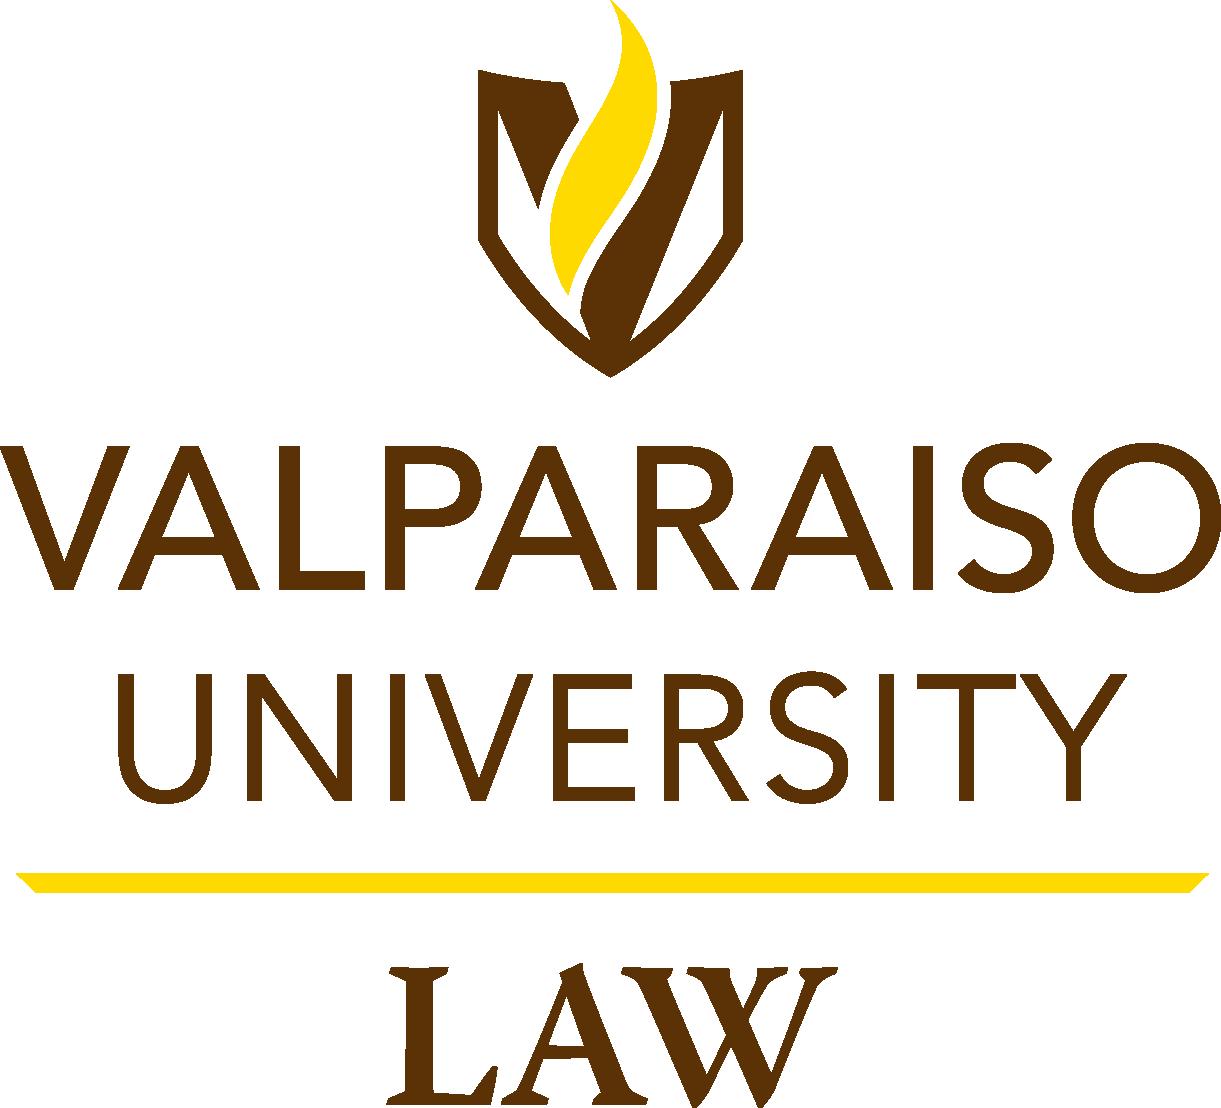 Logos | Valparaiso University Law School | Valparaiso ...